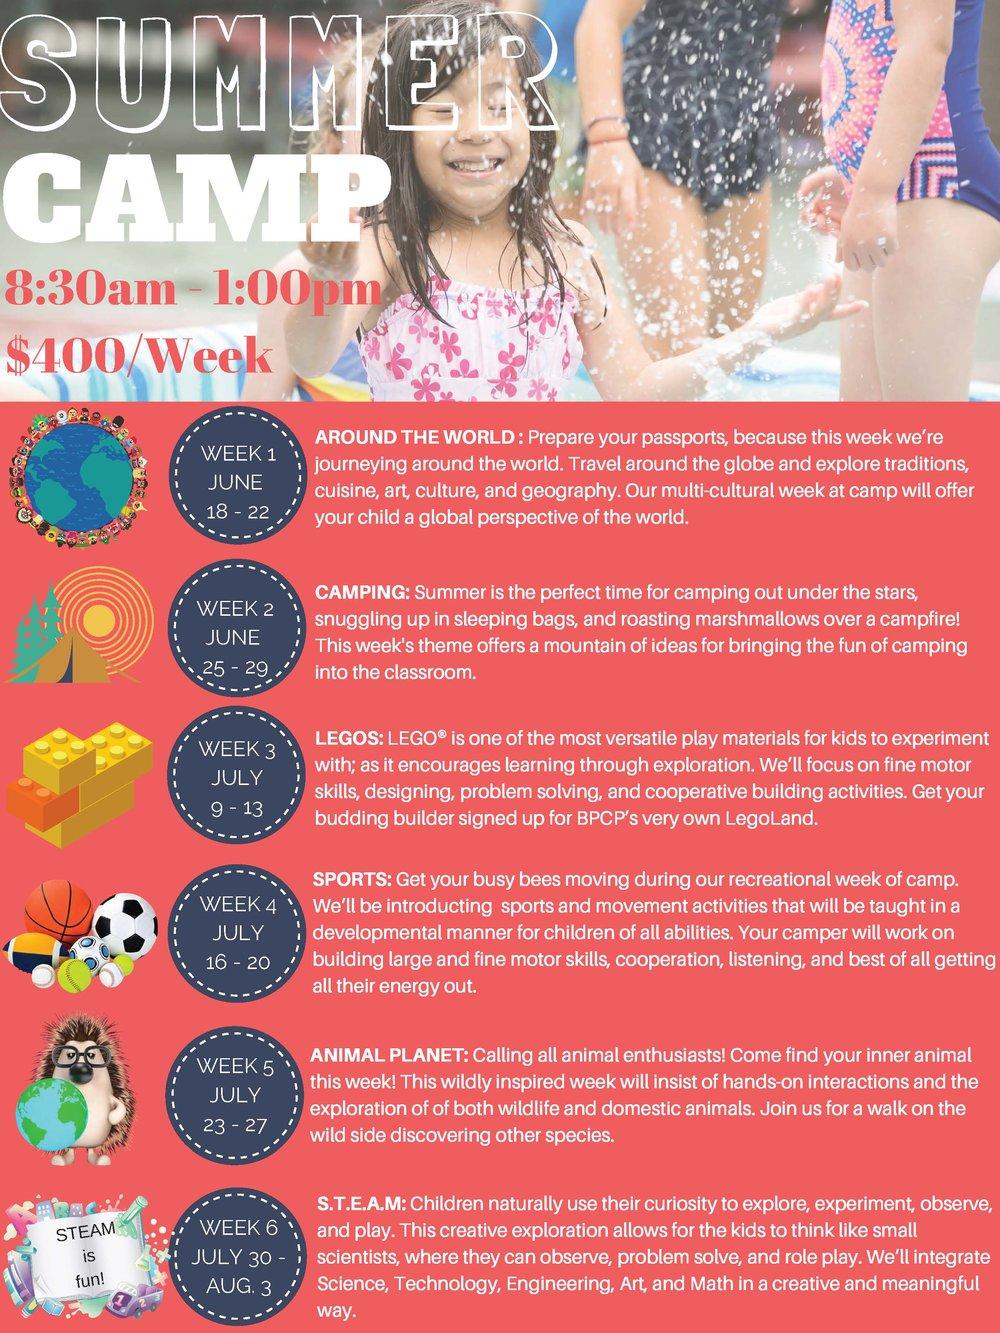 Summer Camp Edit1.jpg